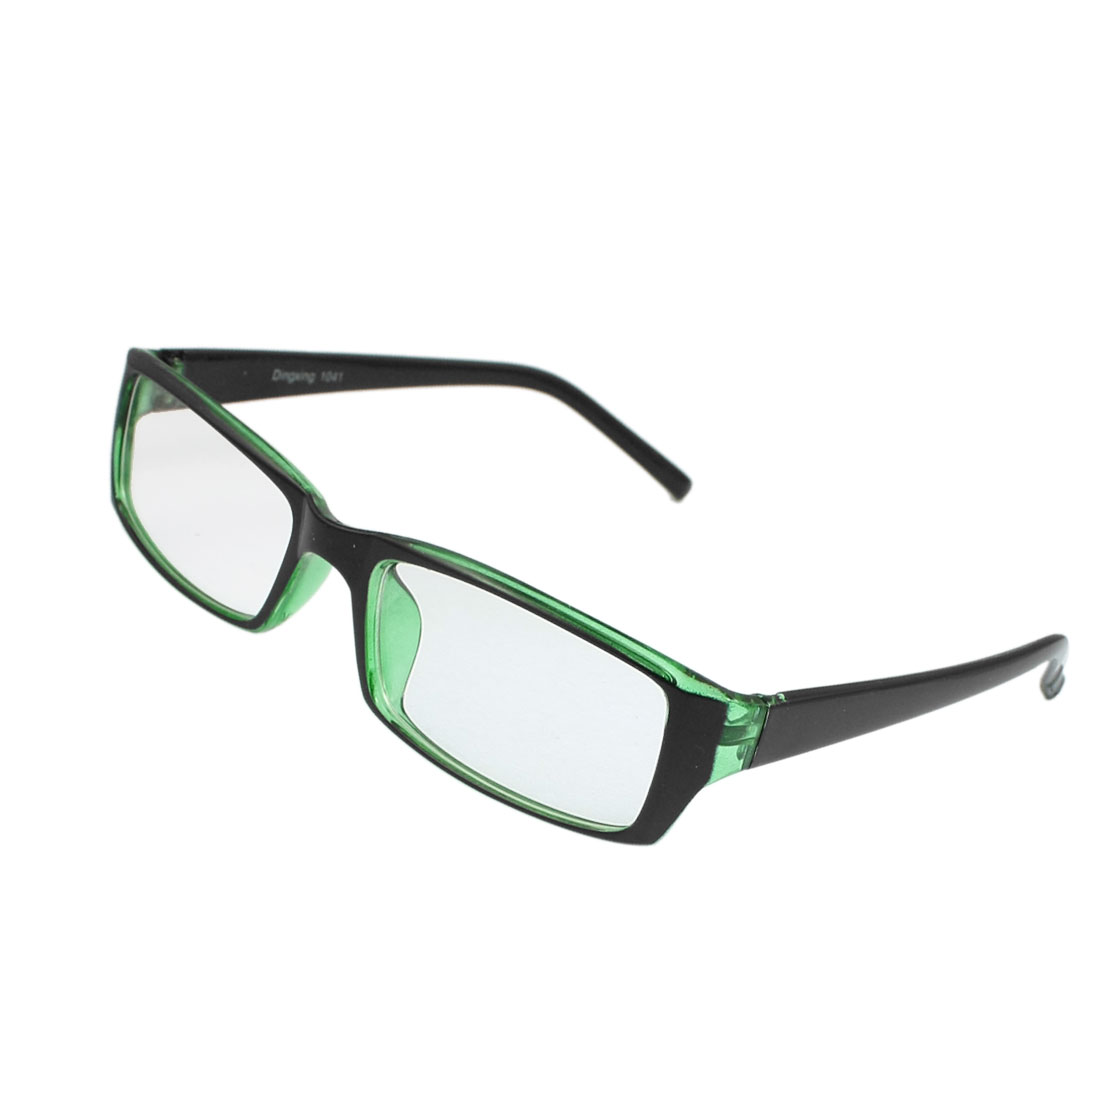 Women Men Plastic Arms Rectangle Shape Lens Plain Plano Glasses Black Green